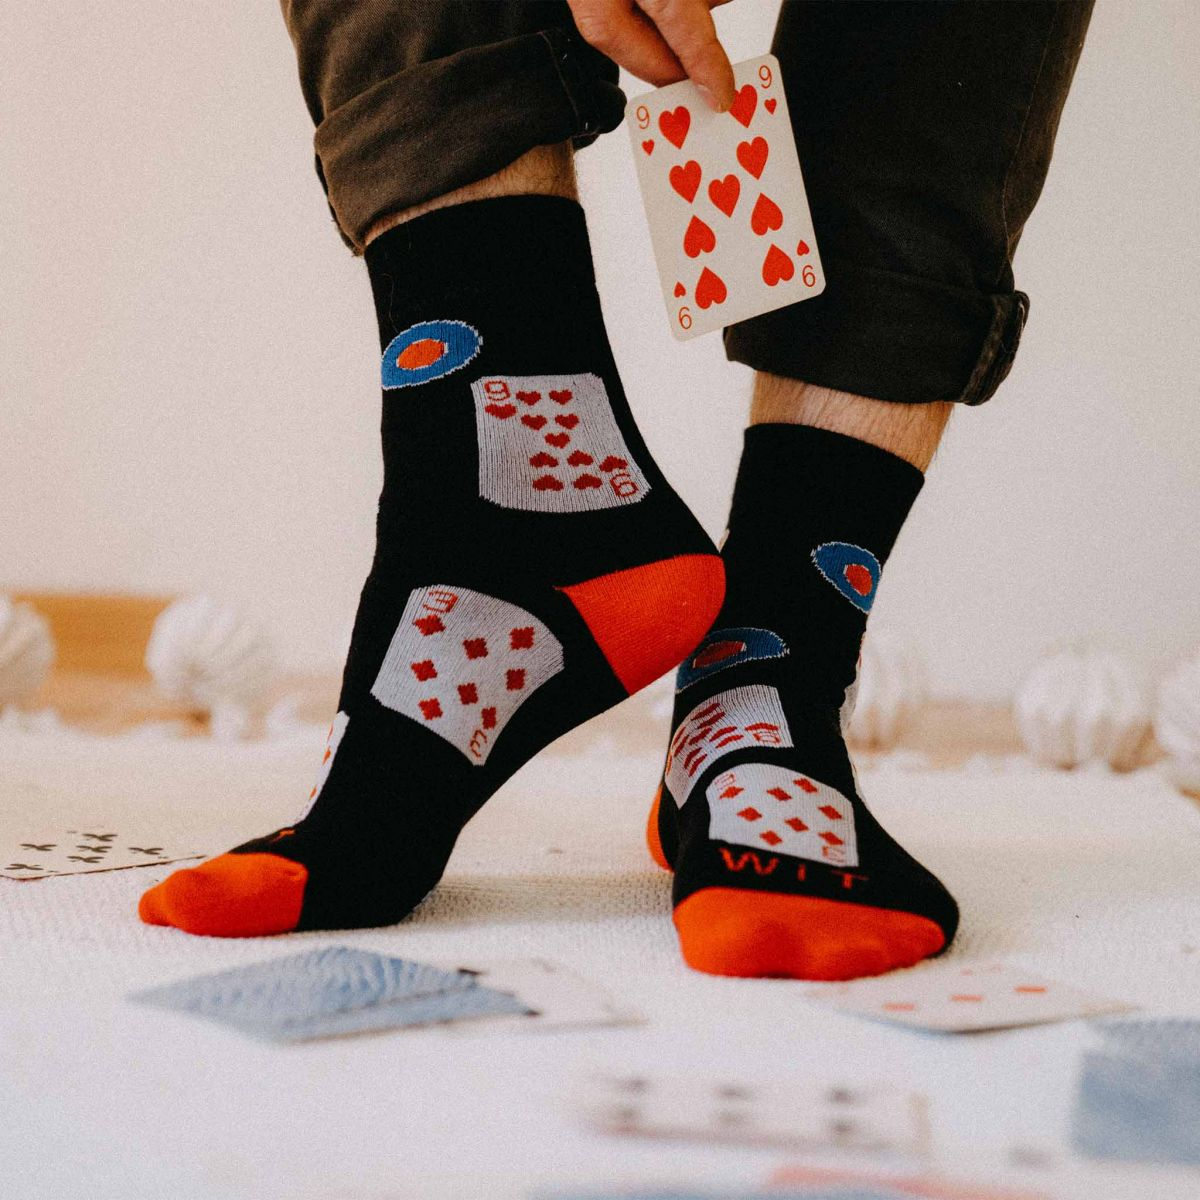 Ponožky - Karty